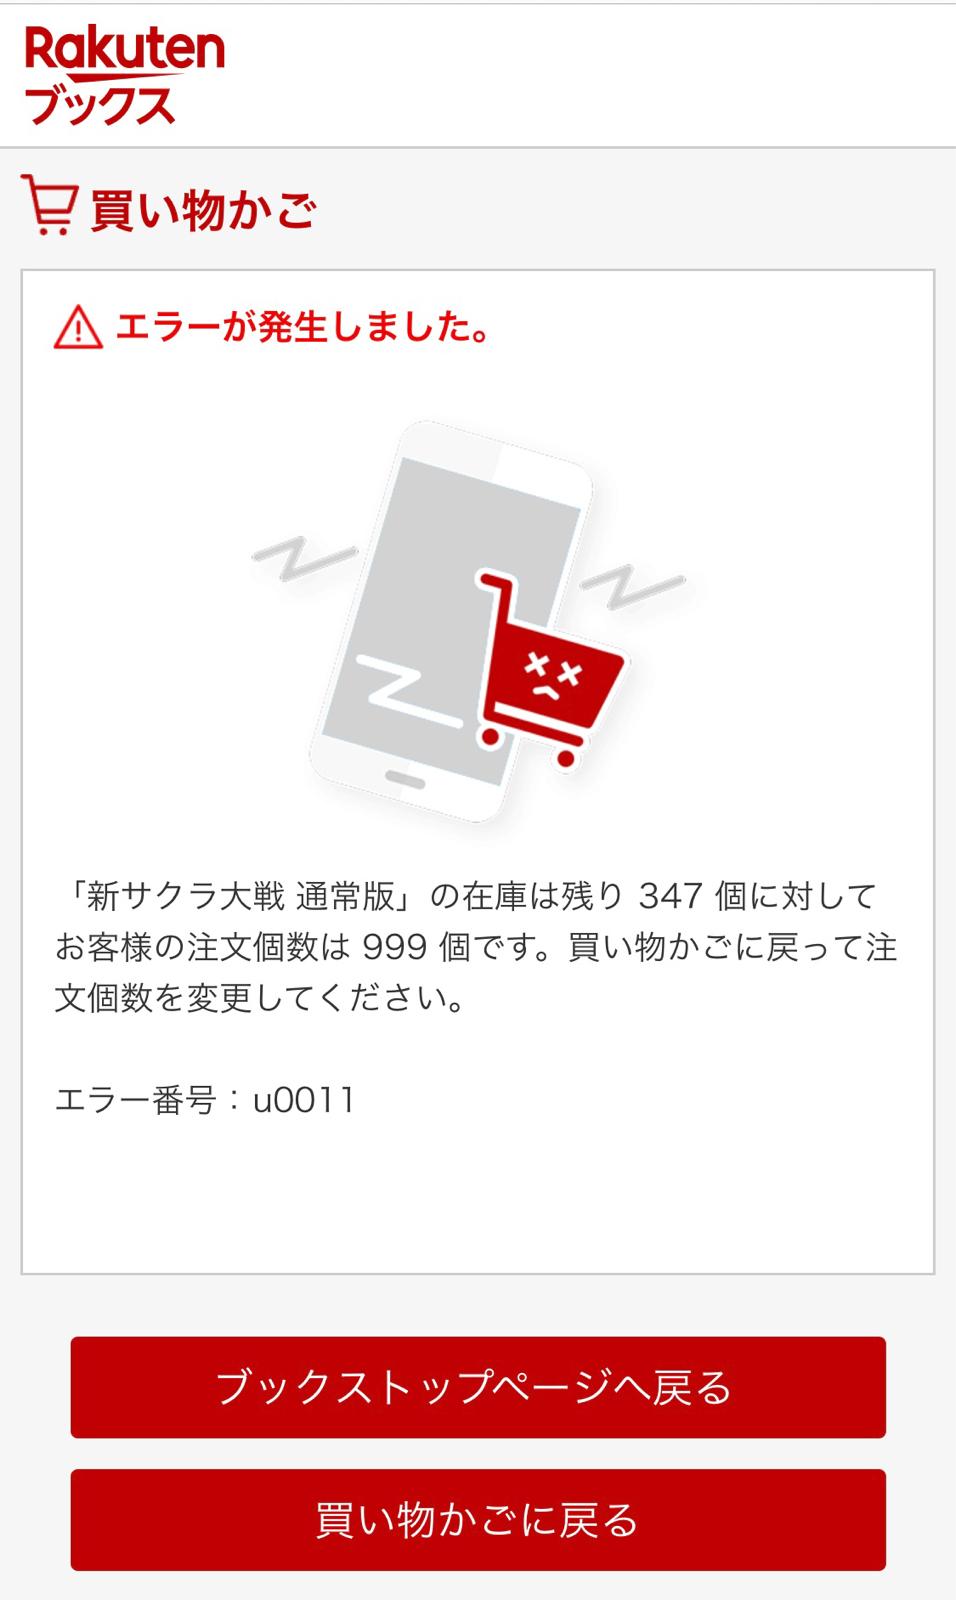 T3PjBY0 - 【悲報】PS4「新サクラ大戦」、定価から71%オフ、新品2750円まで値崩れ!!!!